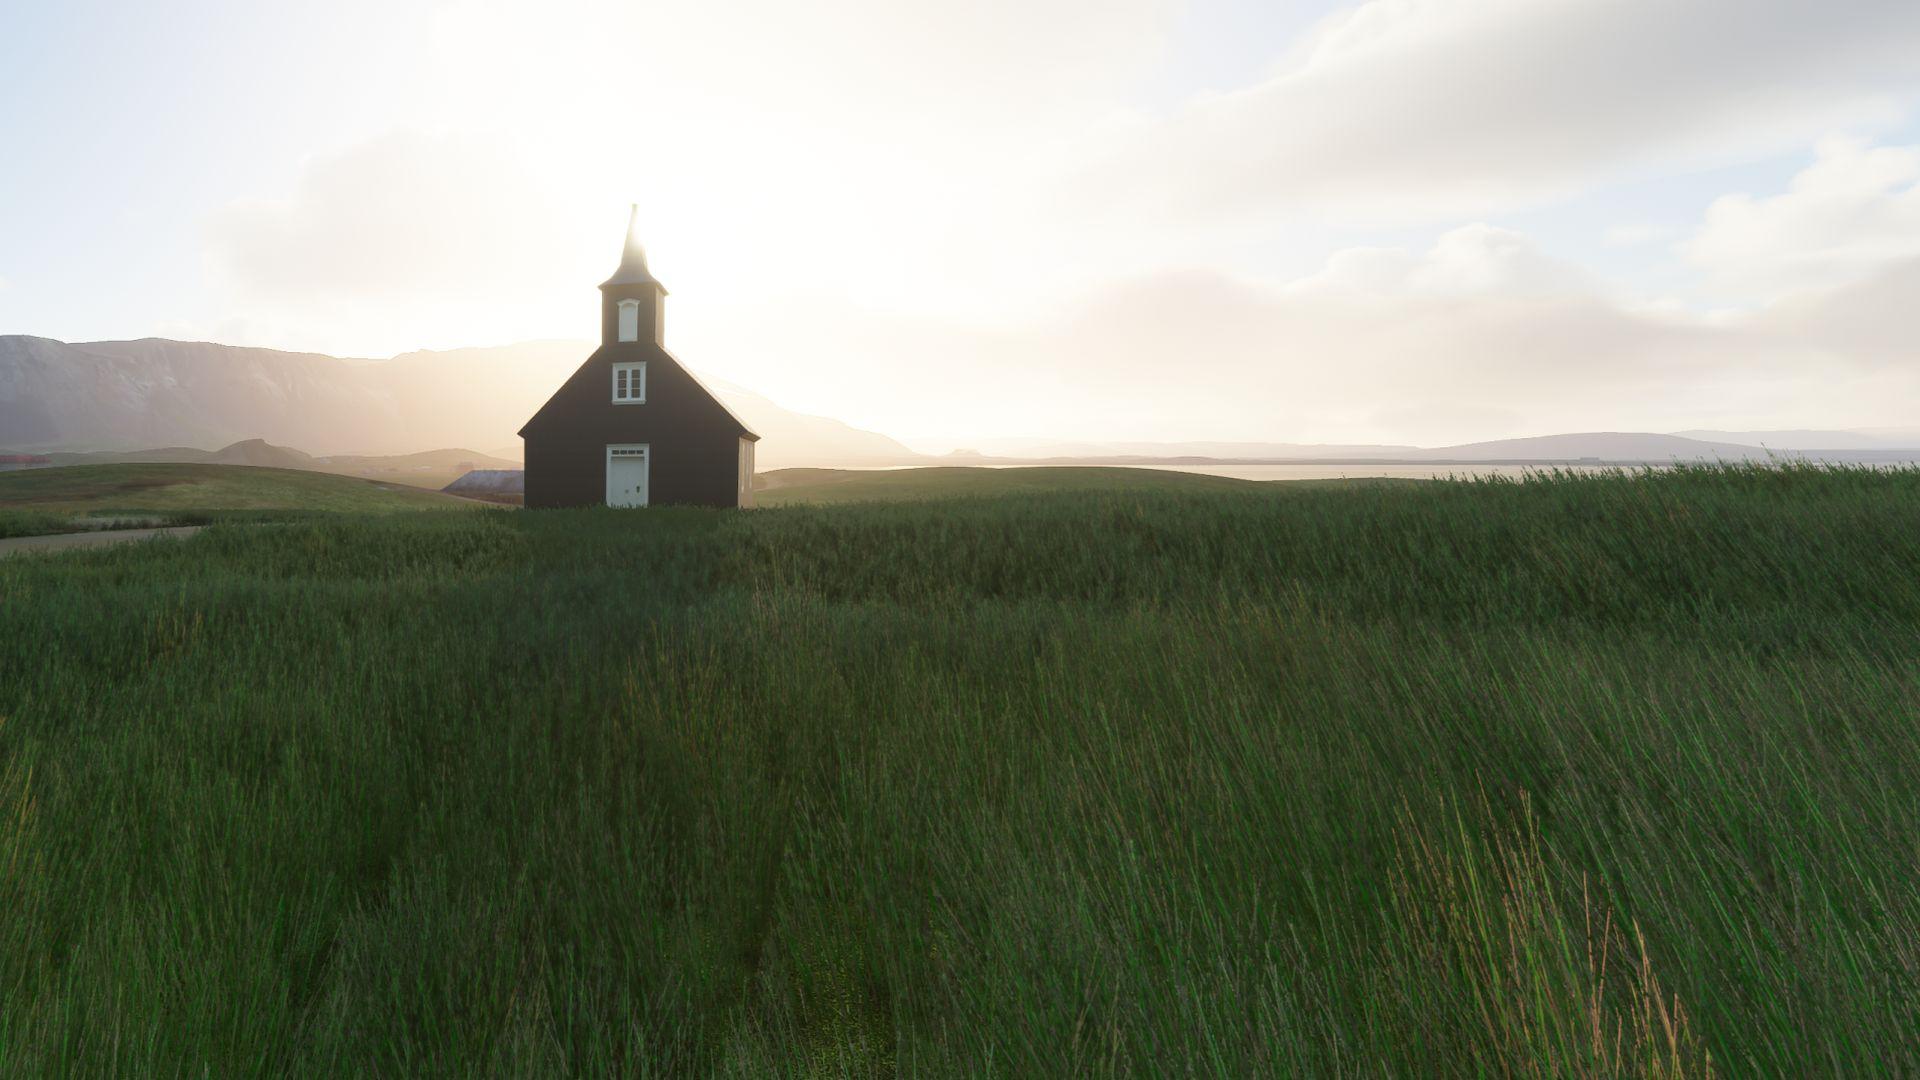 Una captura de pantalla de Microsoft Flight Simulator que muestra una sola iglesia de madera en Islandia